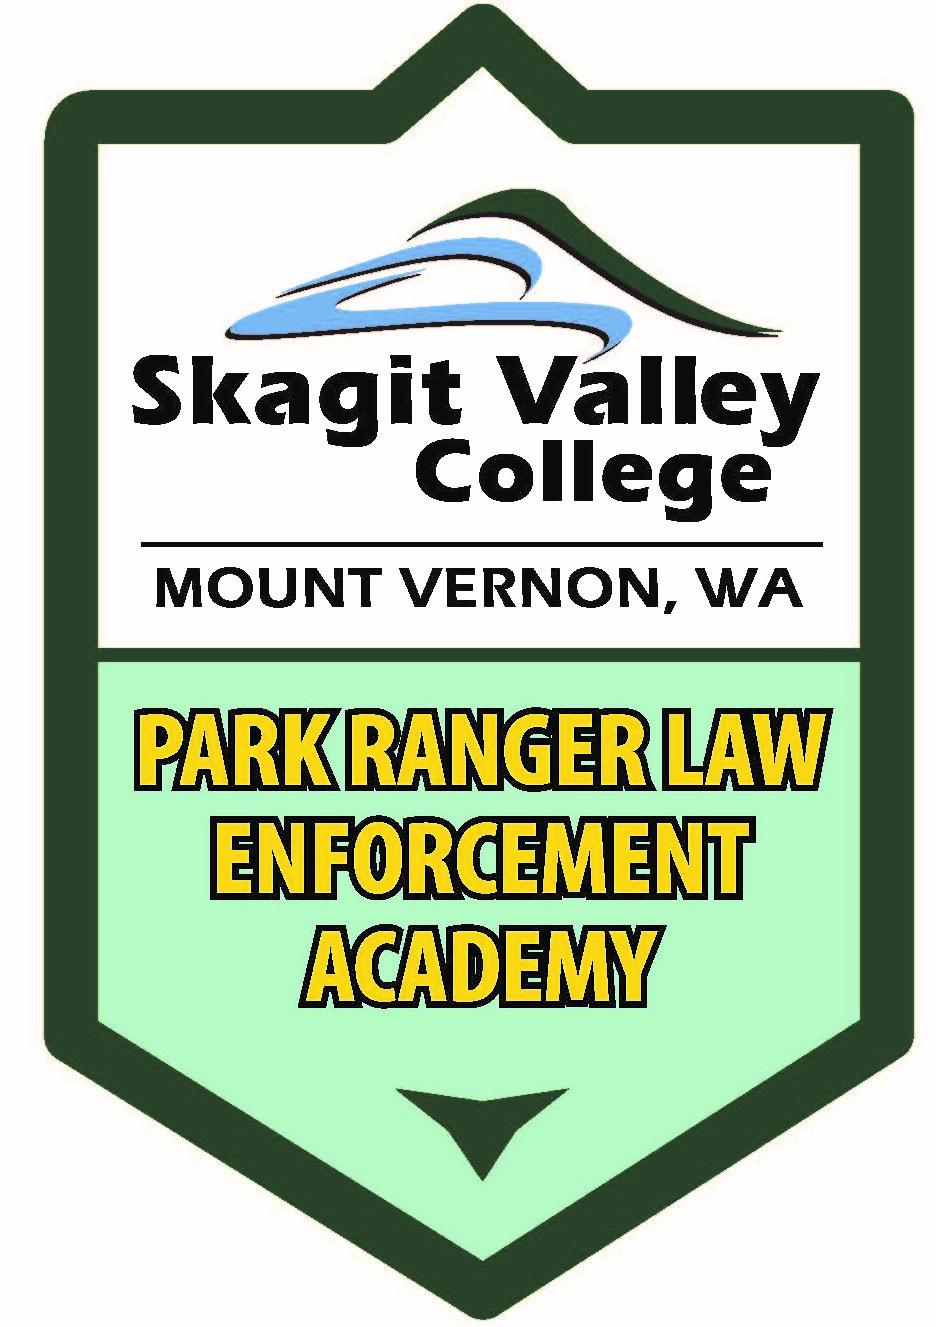 Park Ranger Law Enforcement Academy Badge